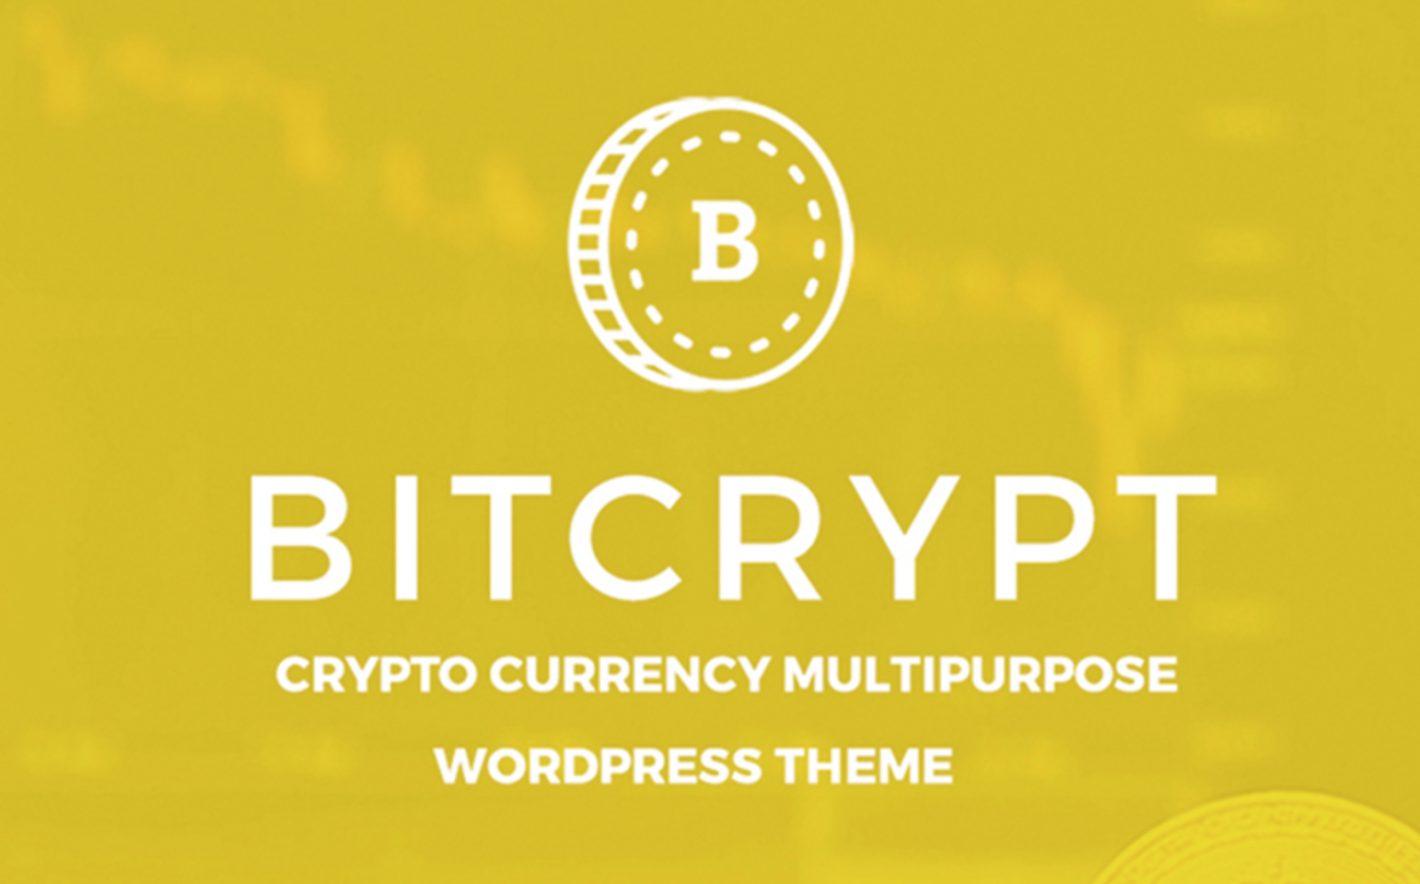 Bitcrypt WordPress Theme Free And Premium